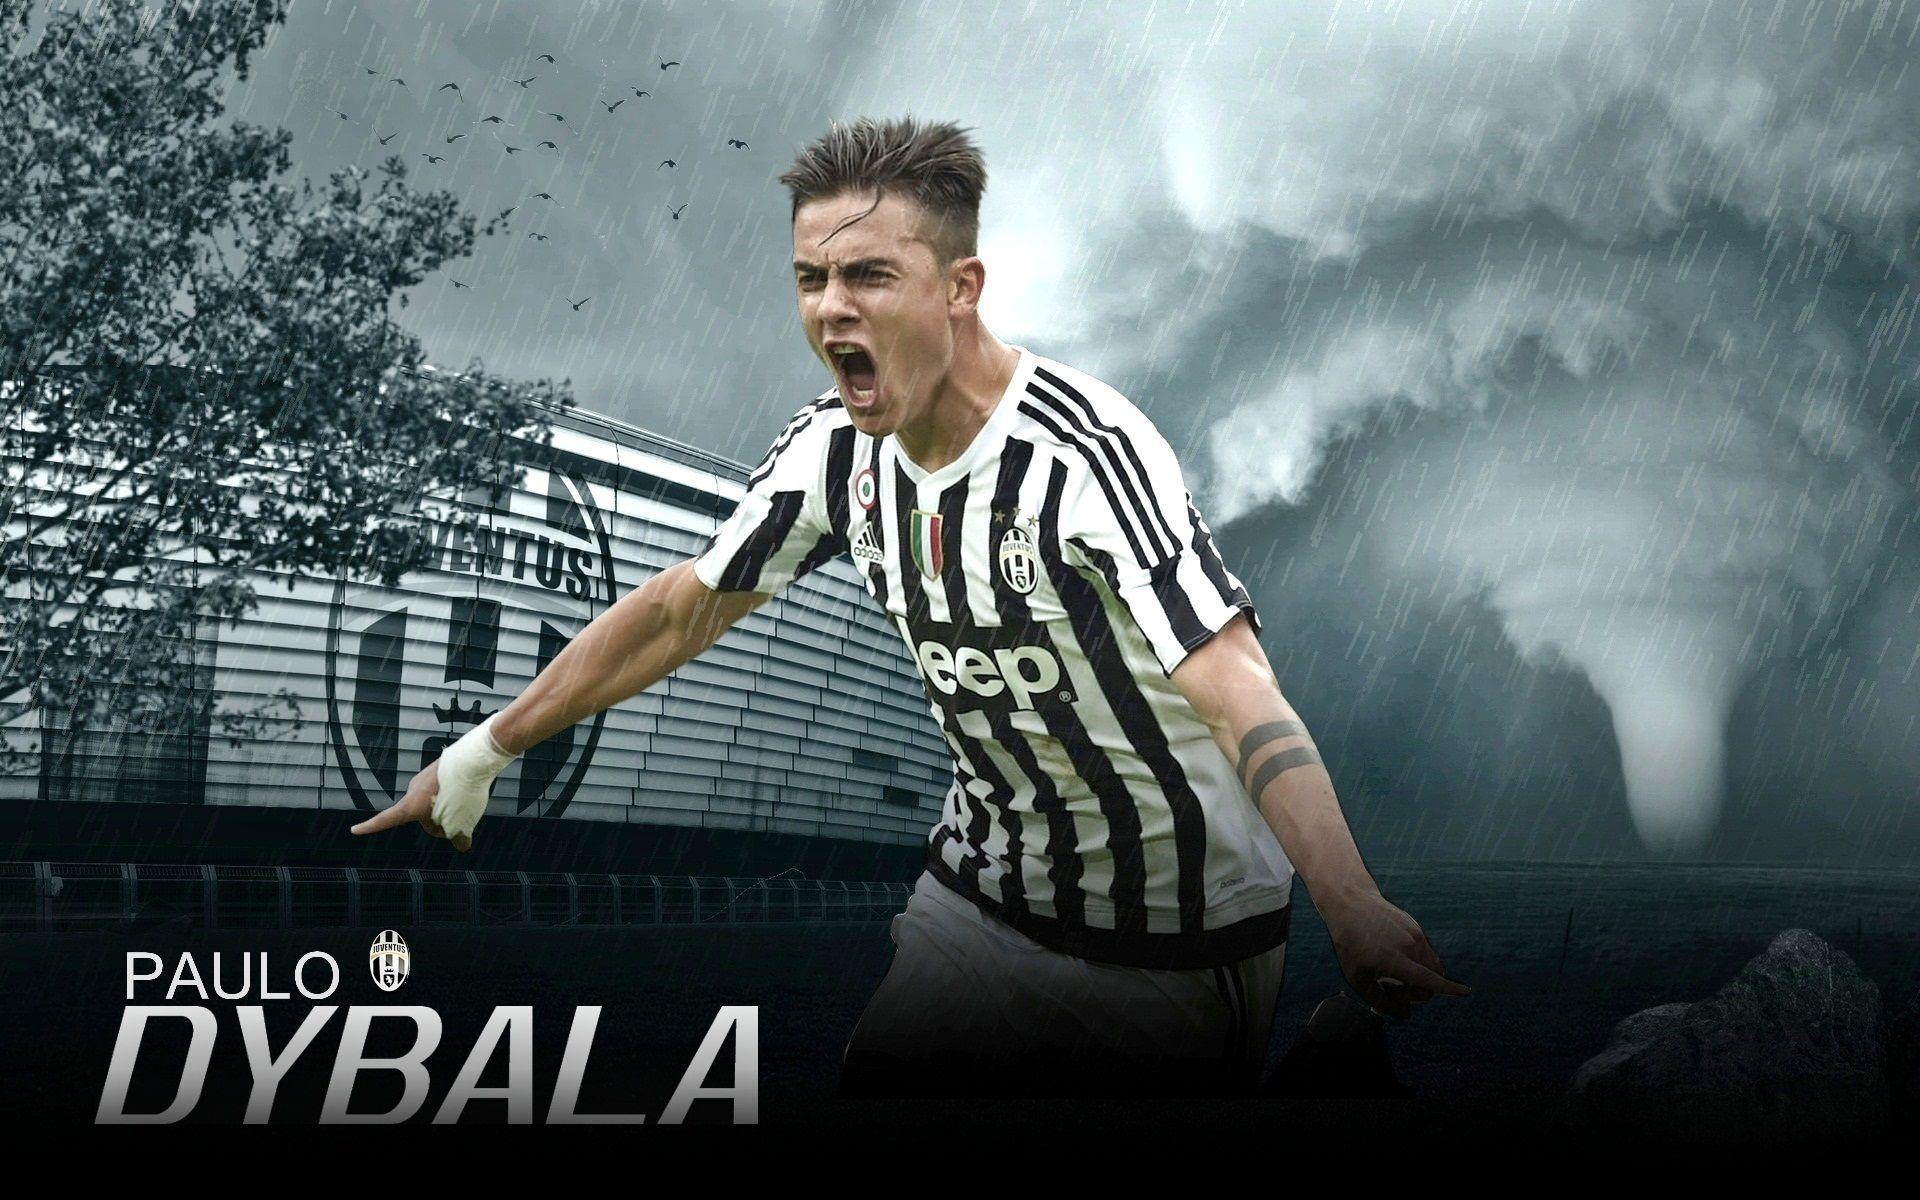 Paulo Dybala Great Player Wallpaper #4497 Wallpaper Themes ...